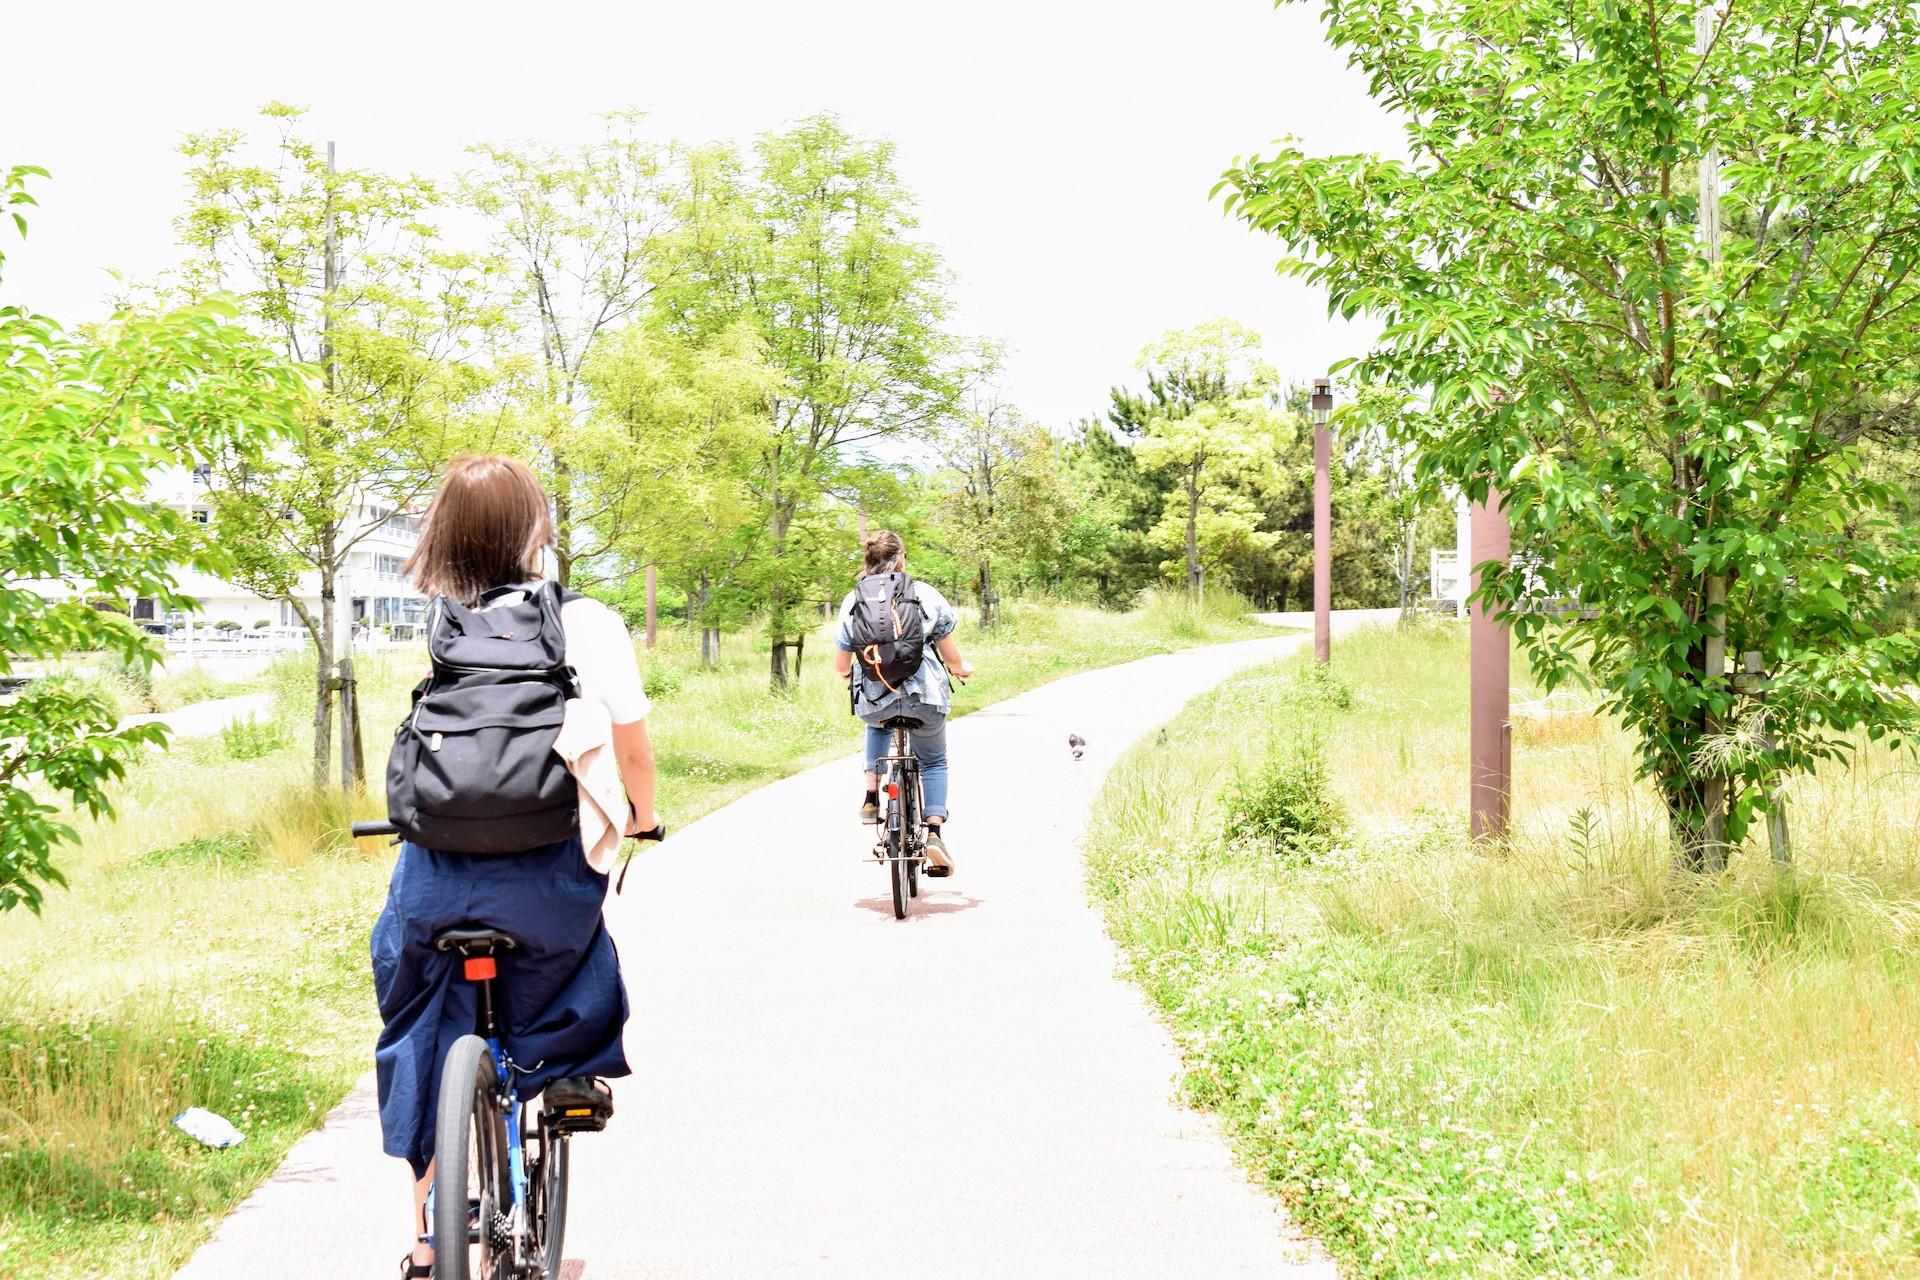 bicycling Beppu Onsen sand bath Kaihin Sunayu